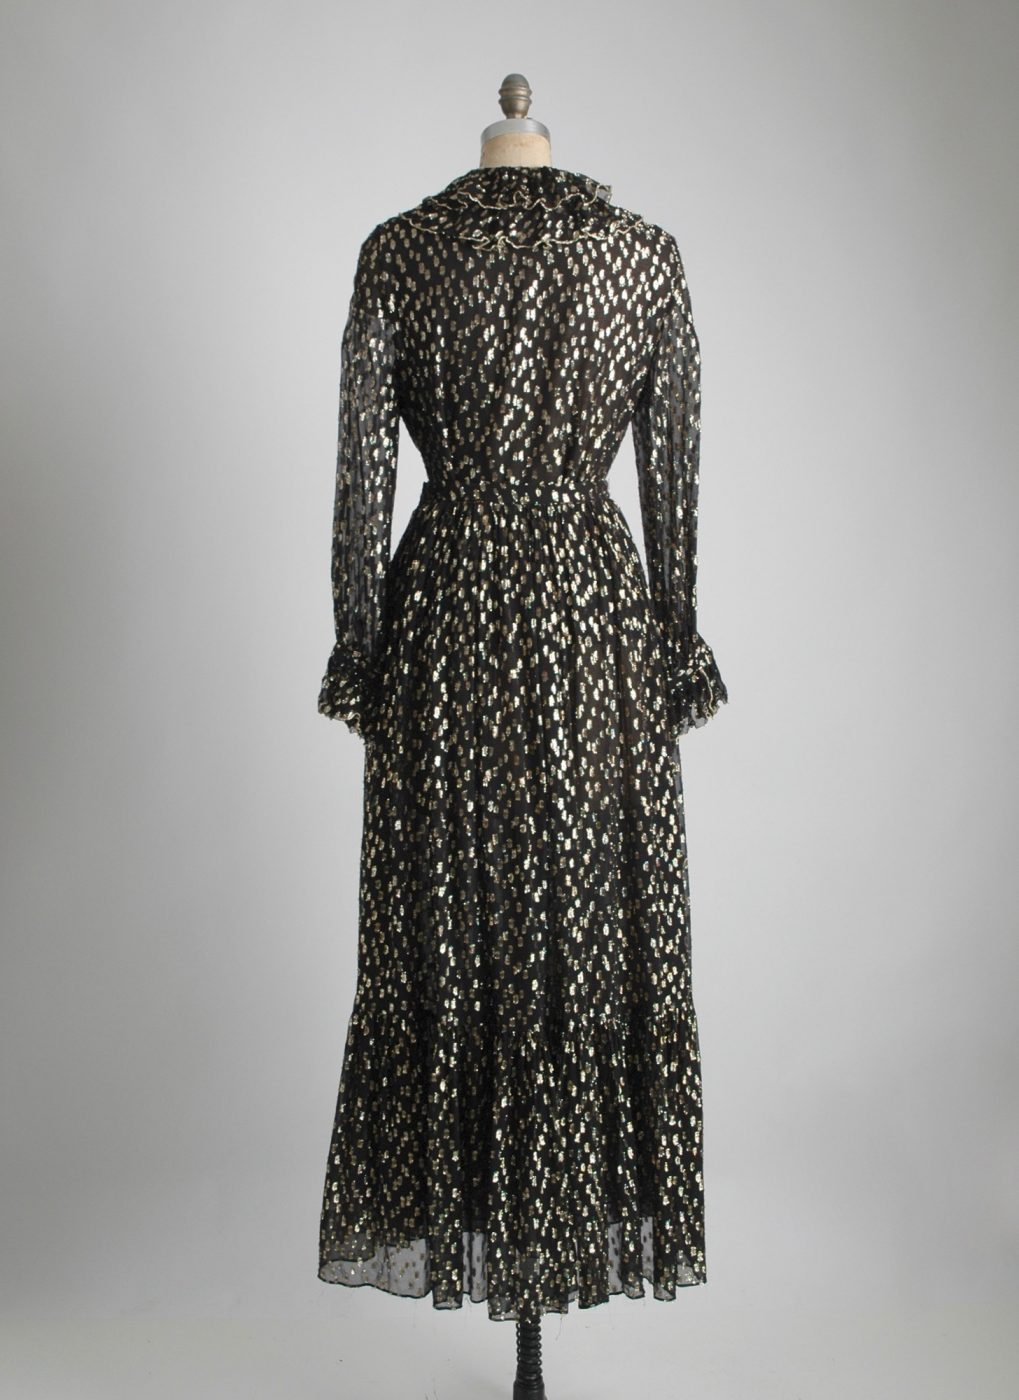 COMING SOON! 1970s sheer black + gold 2 piece dress